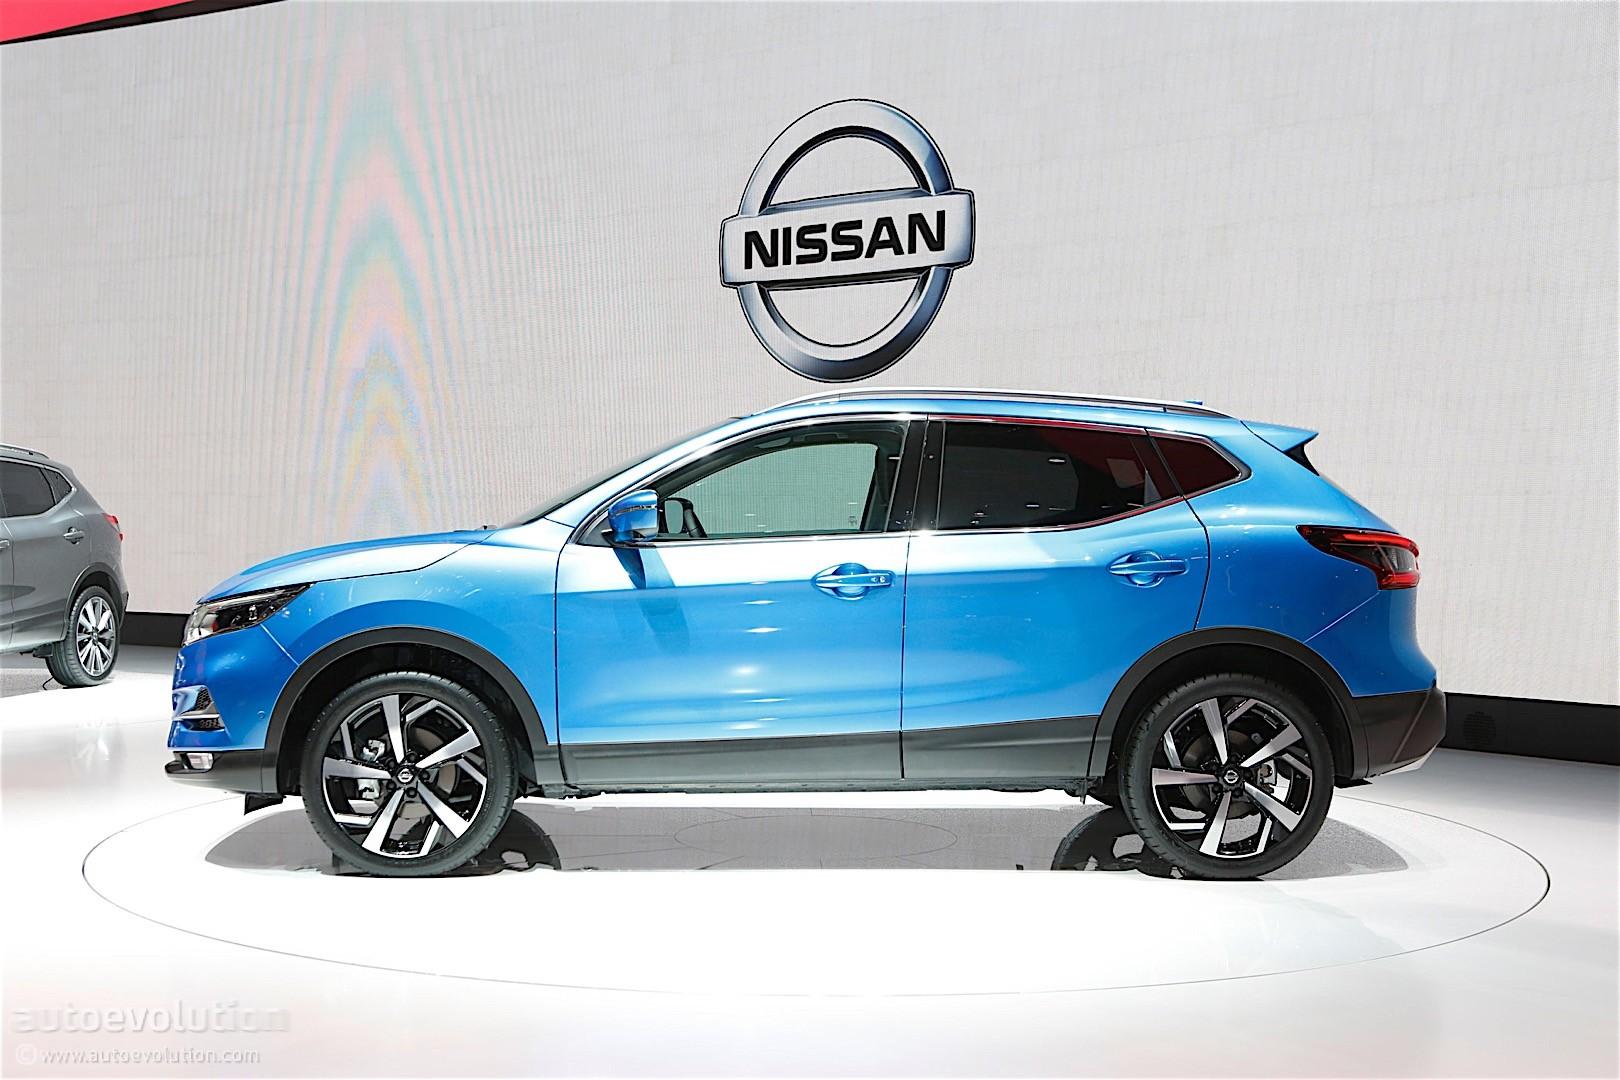 Nissan Crew Cab >> 2014 Nissan Qashqai Rendering - autoevolution